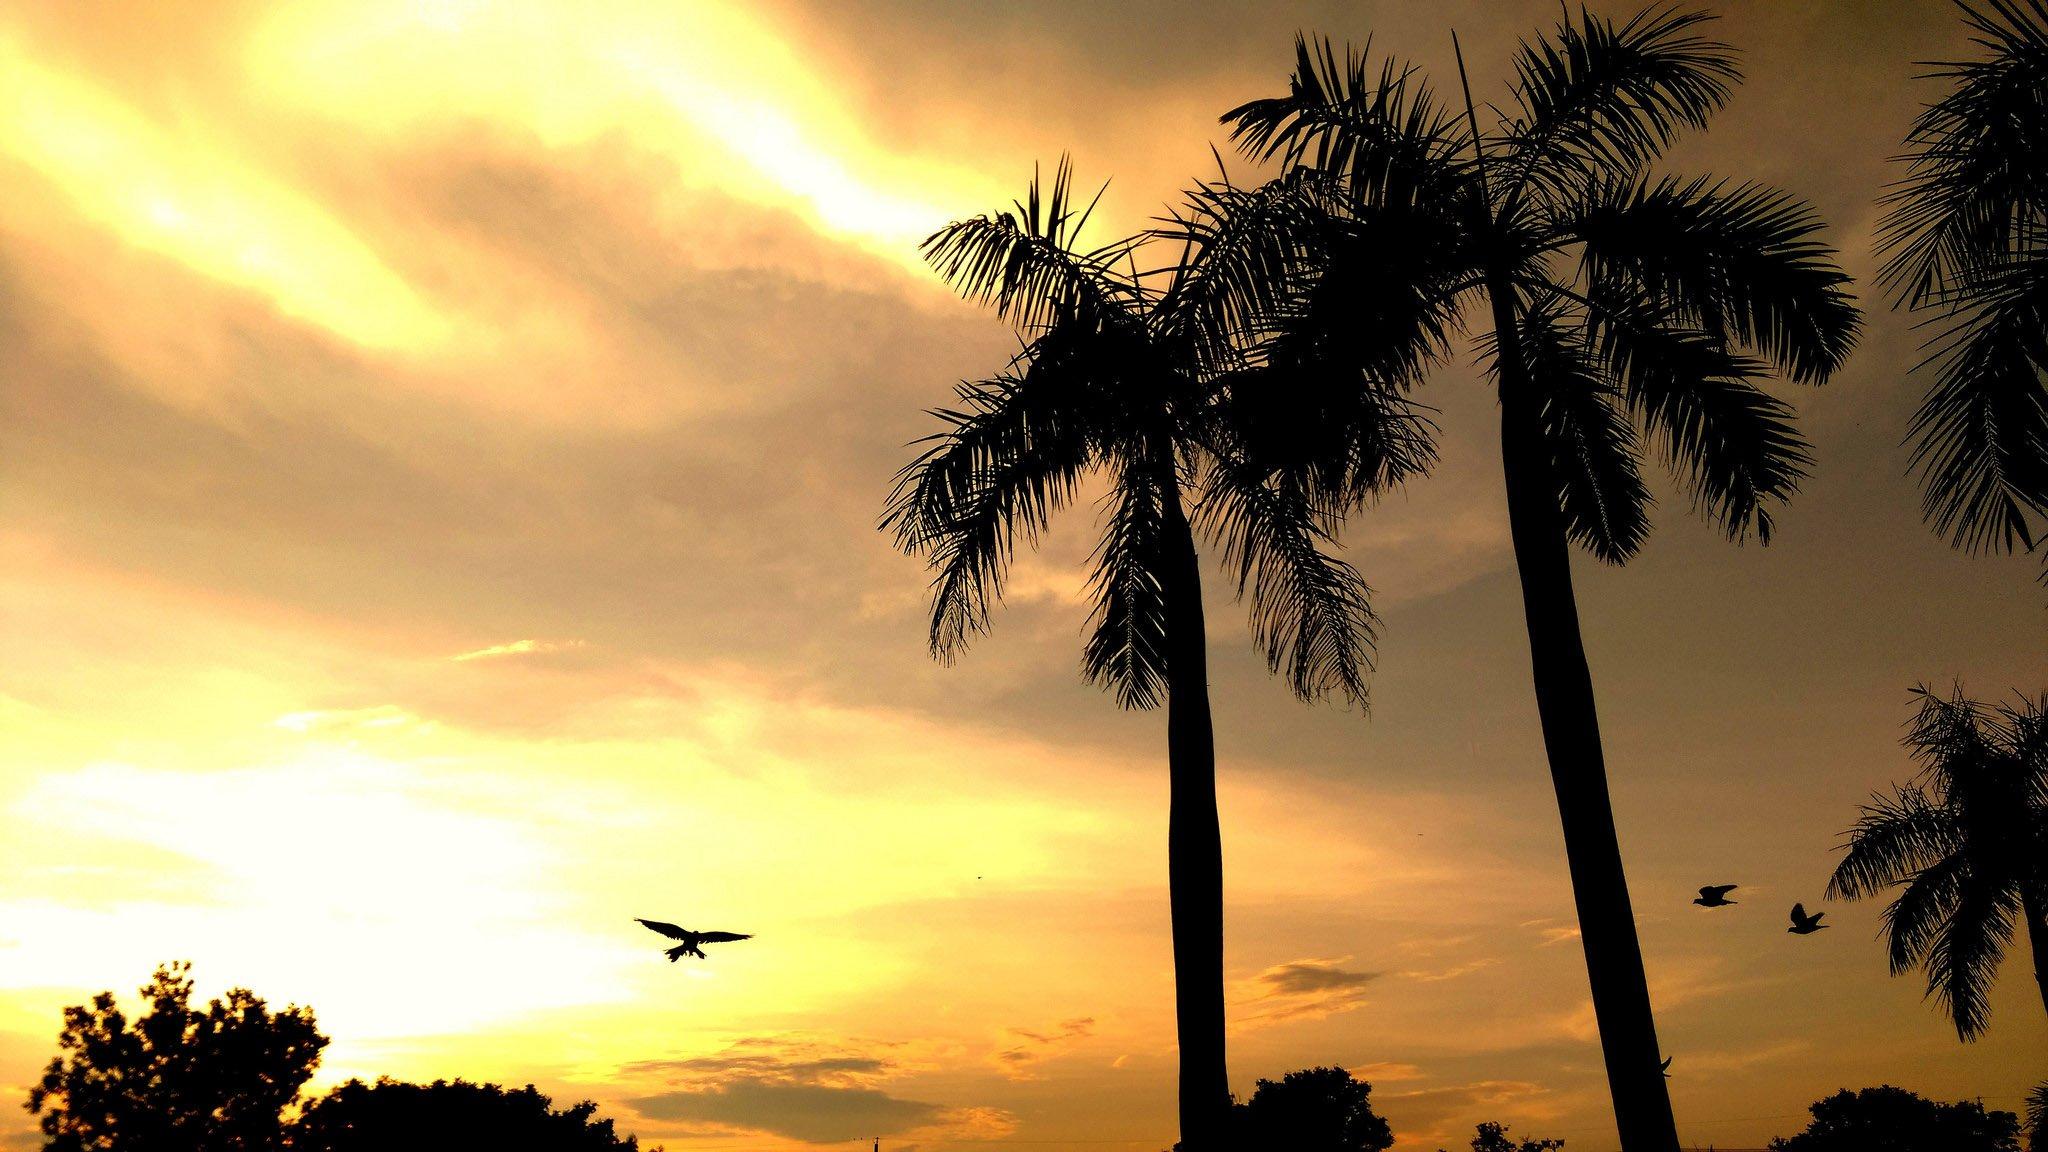 Palm Tree Screensaver full screen hd wallpaper